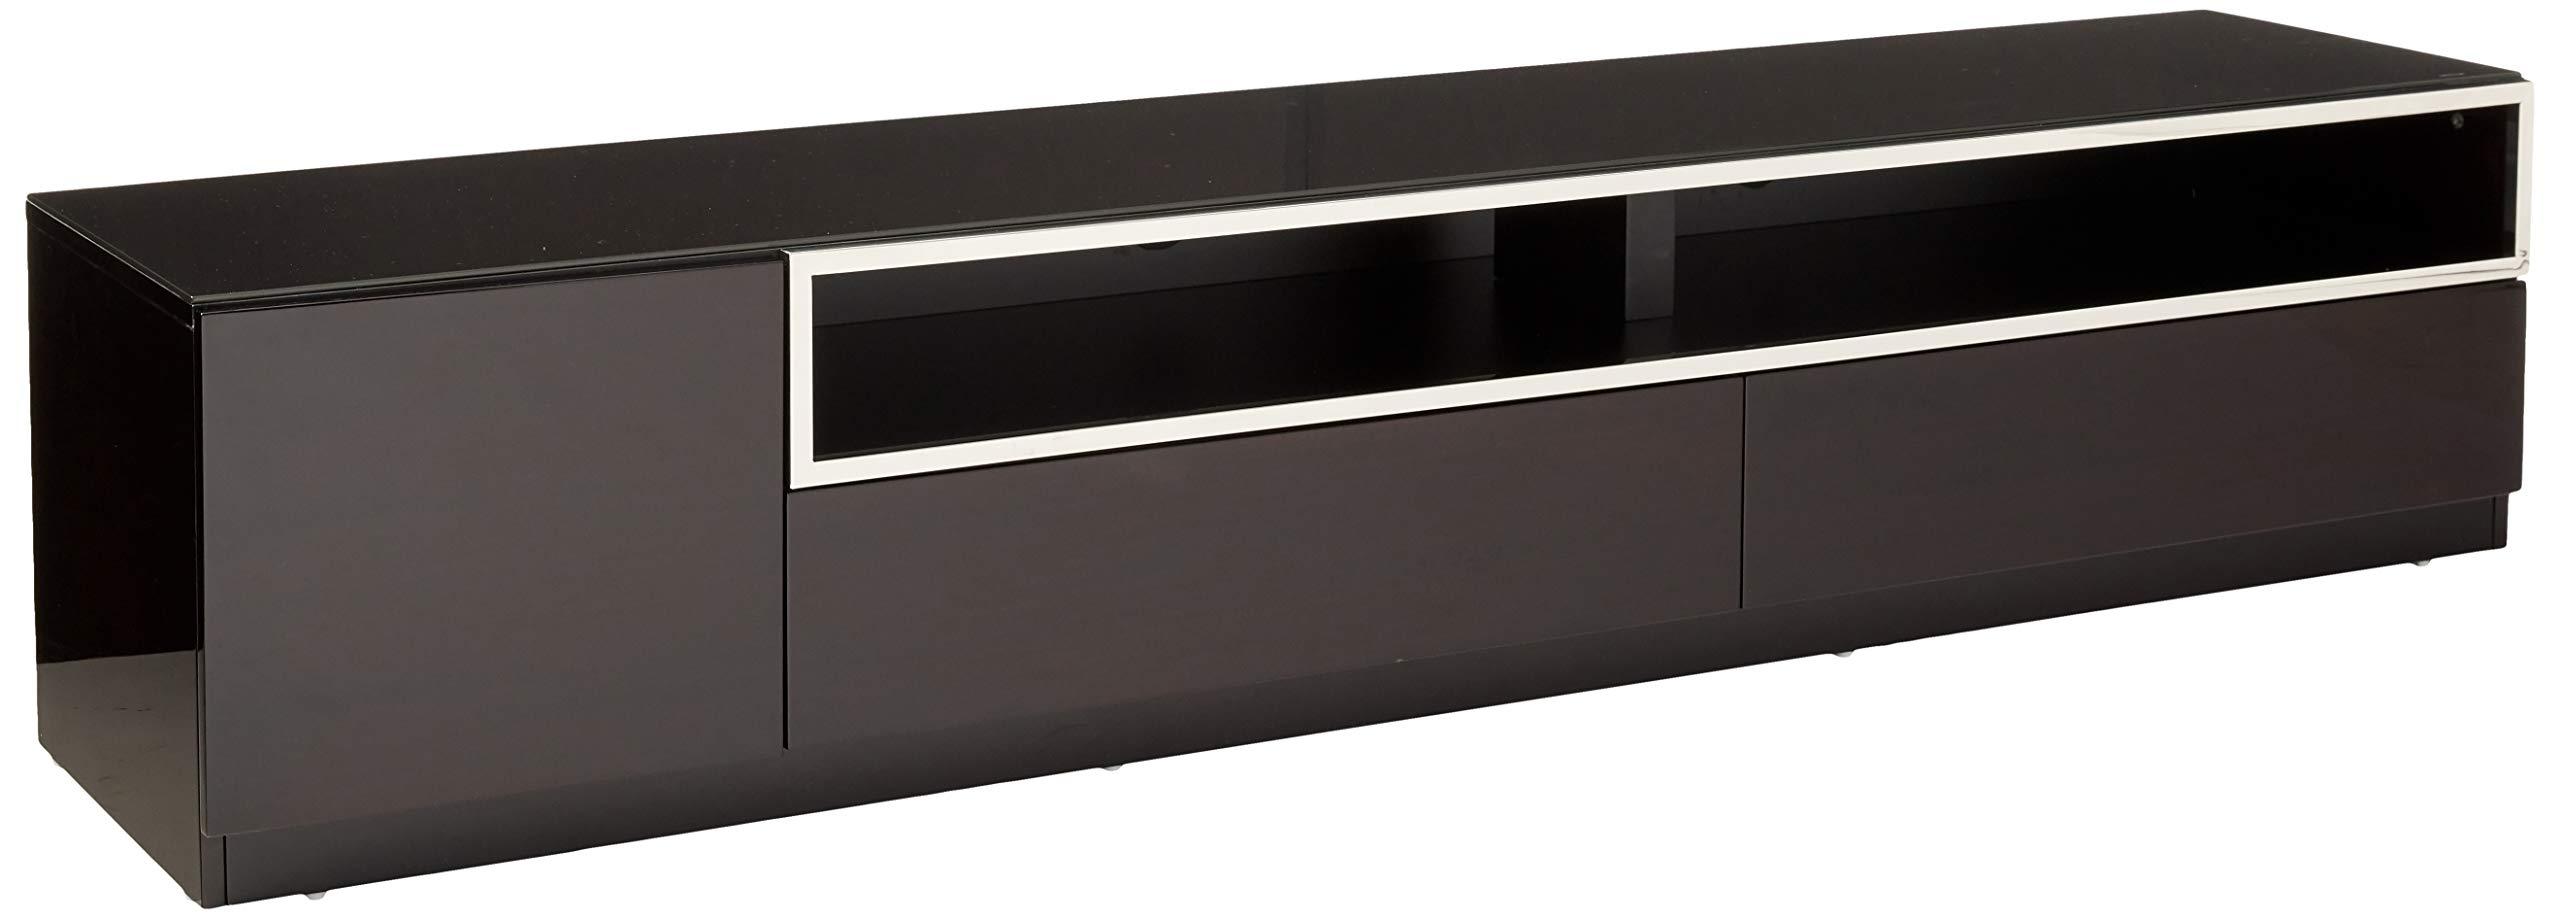 Off White Tv Kast.Amazon Com Prepac Altus Wall Mounted Audio Video Console 48 5 W